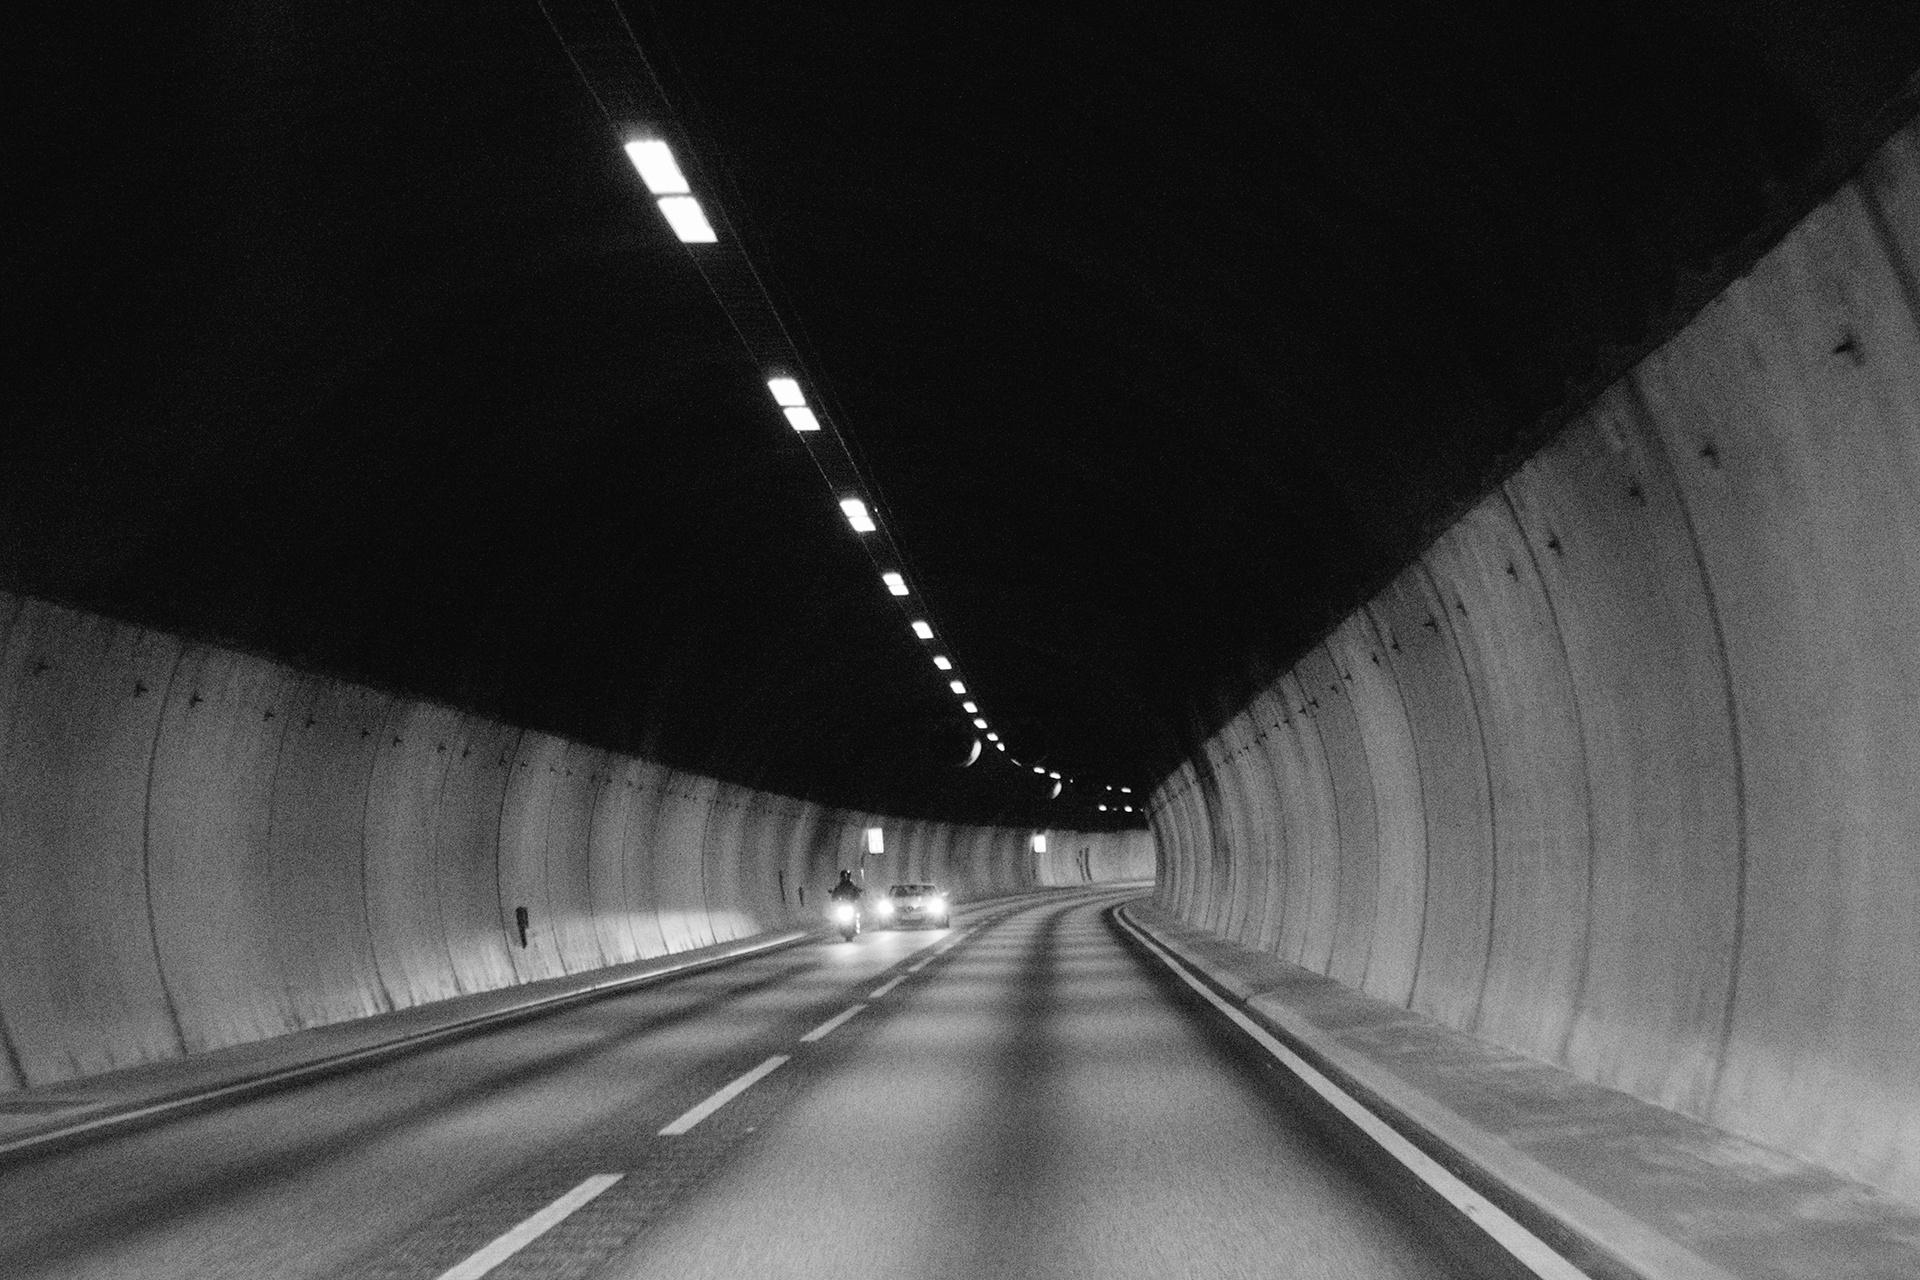 norwaytunnel.jpg